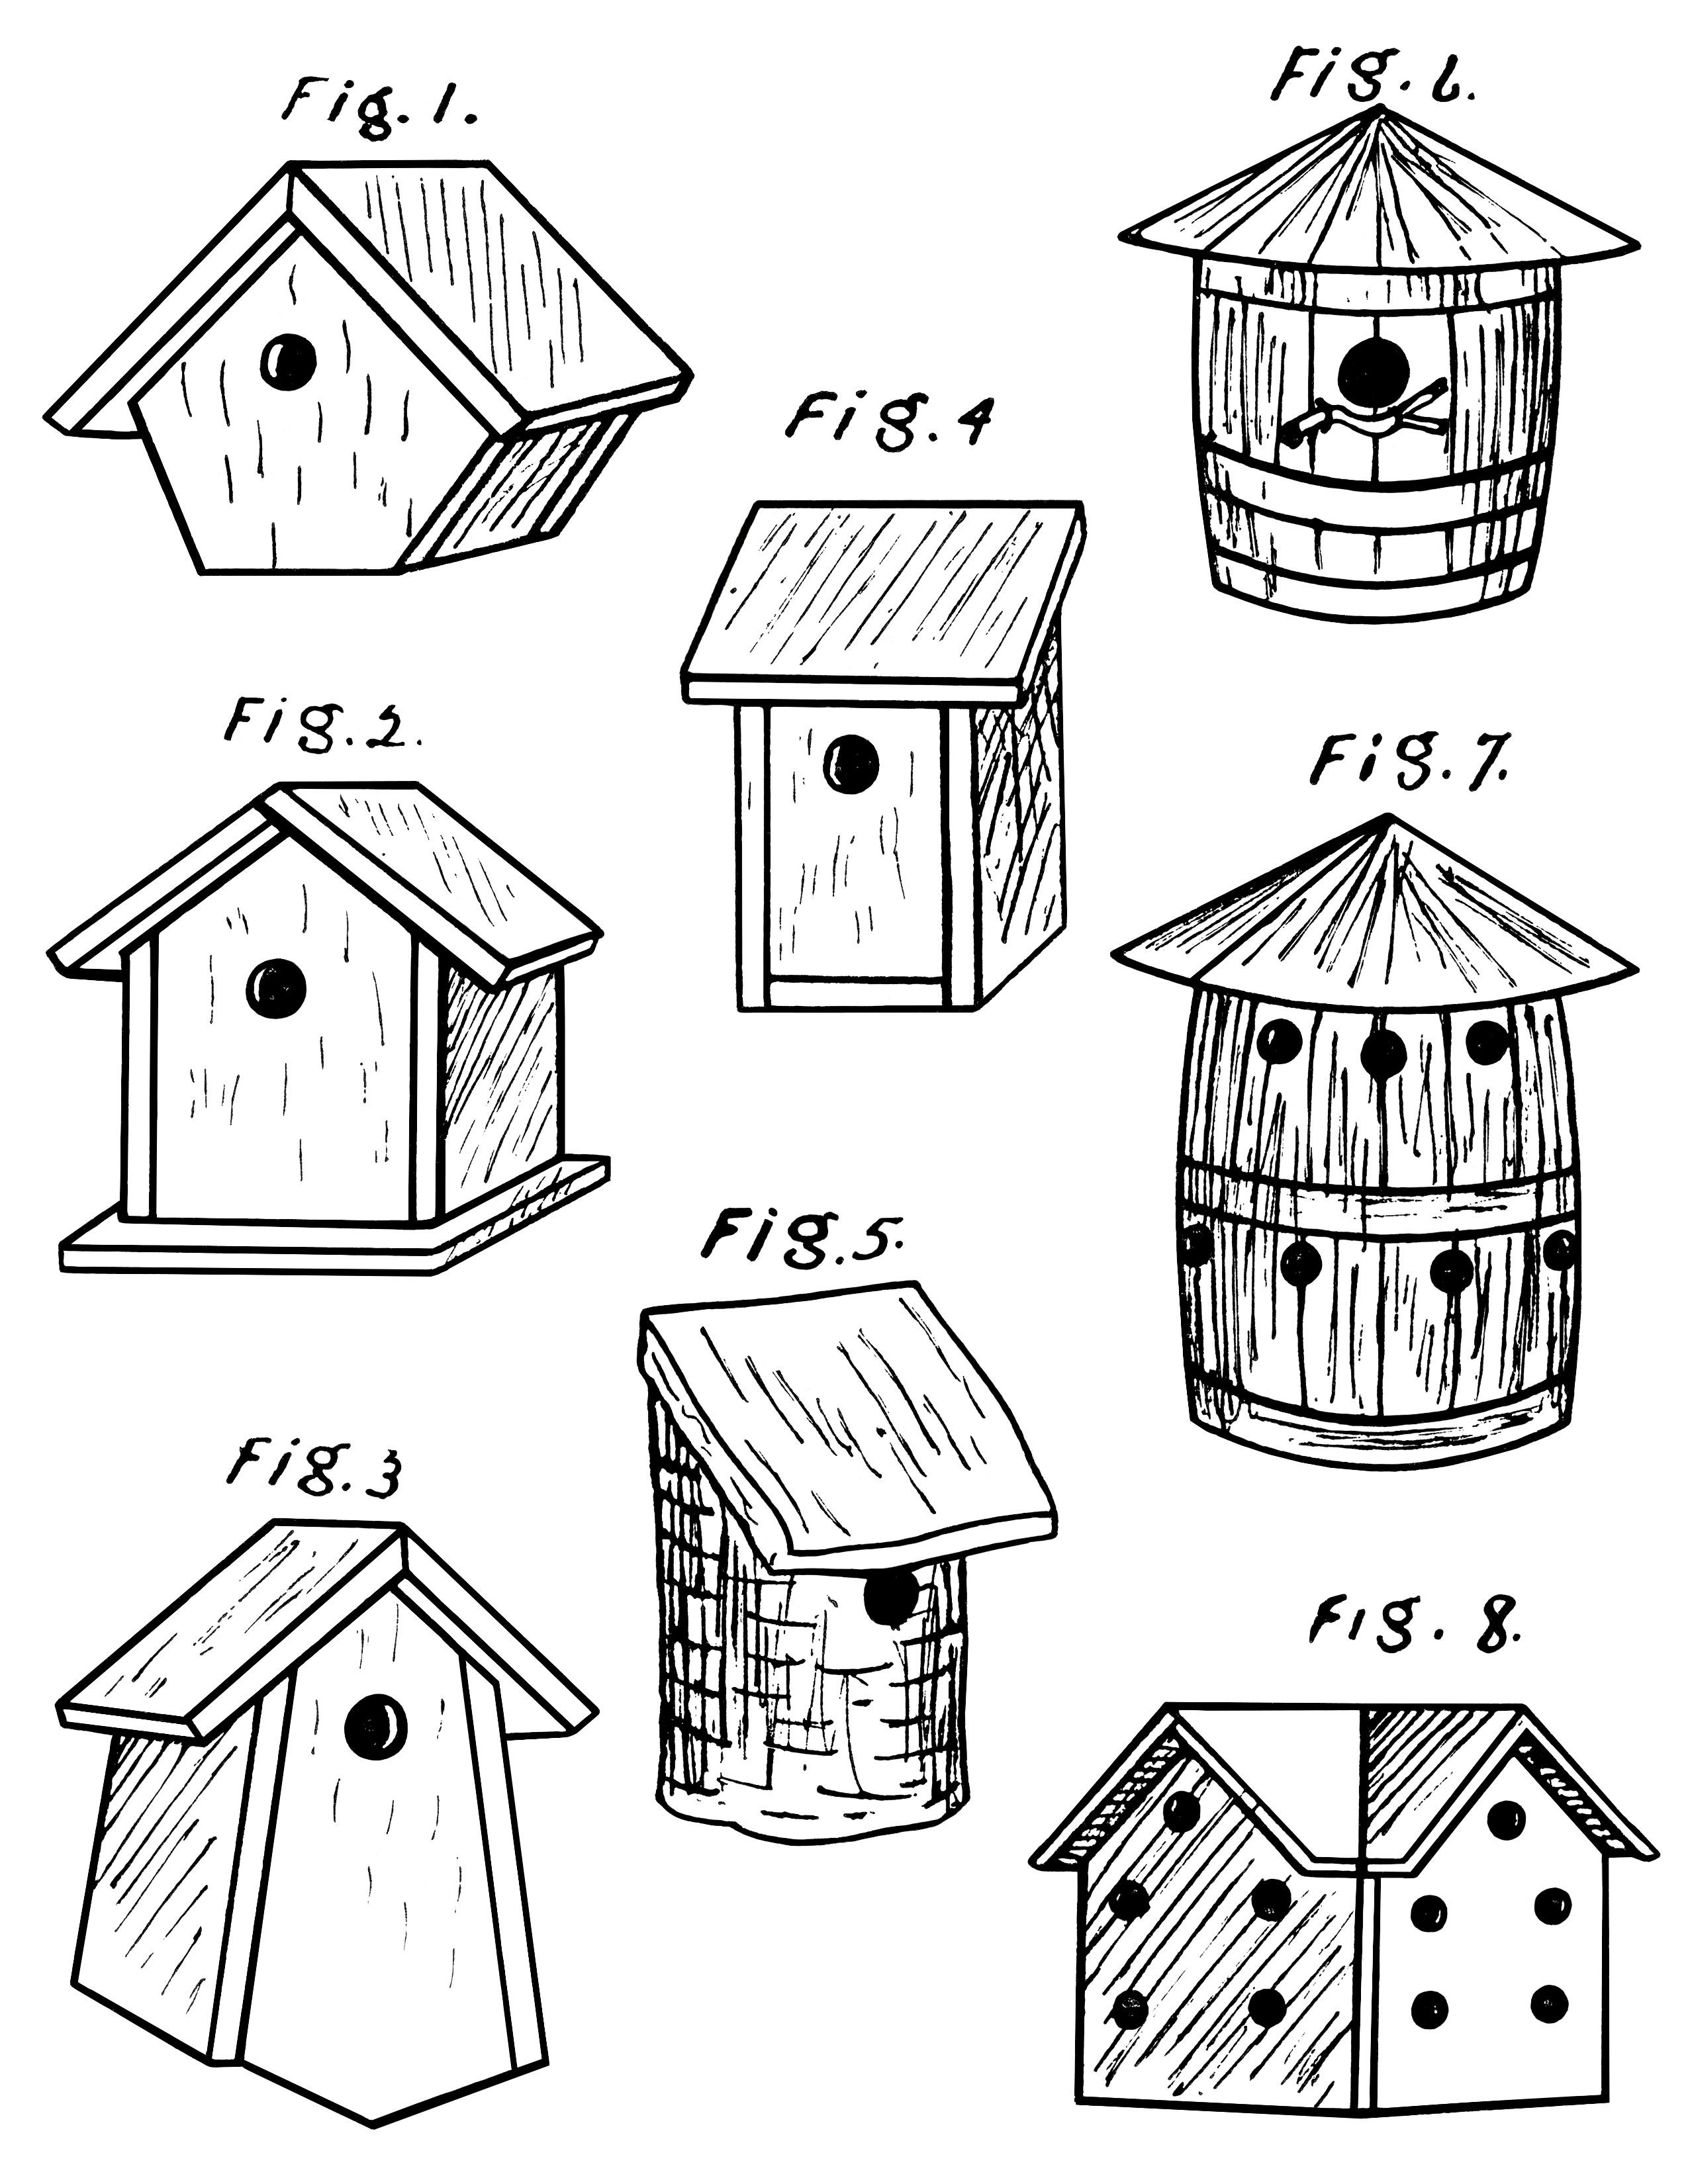 white house diagram trane weathertron heat pump wiring birdhouses free vintage clip art old design shop blog